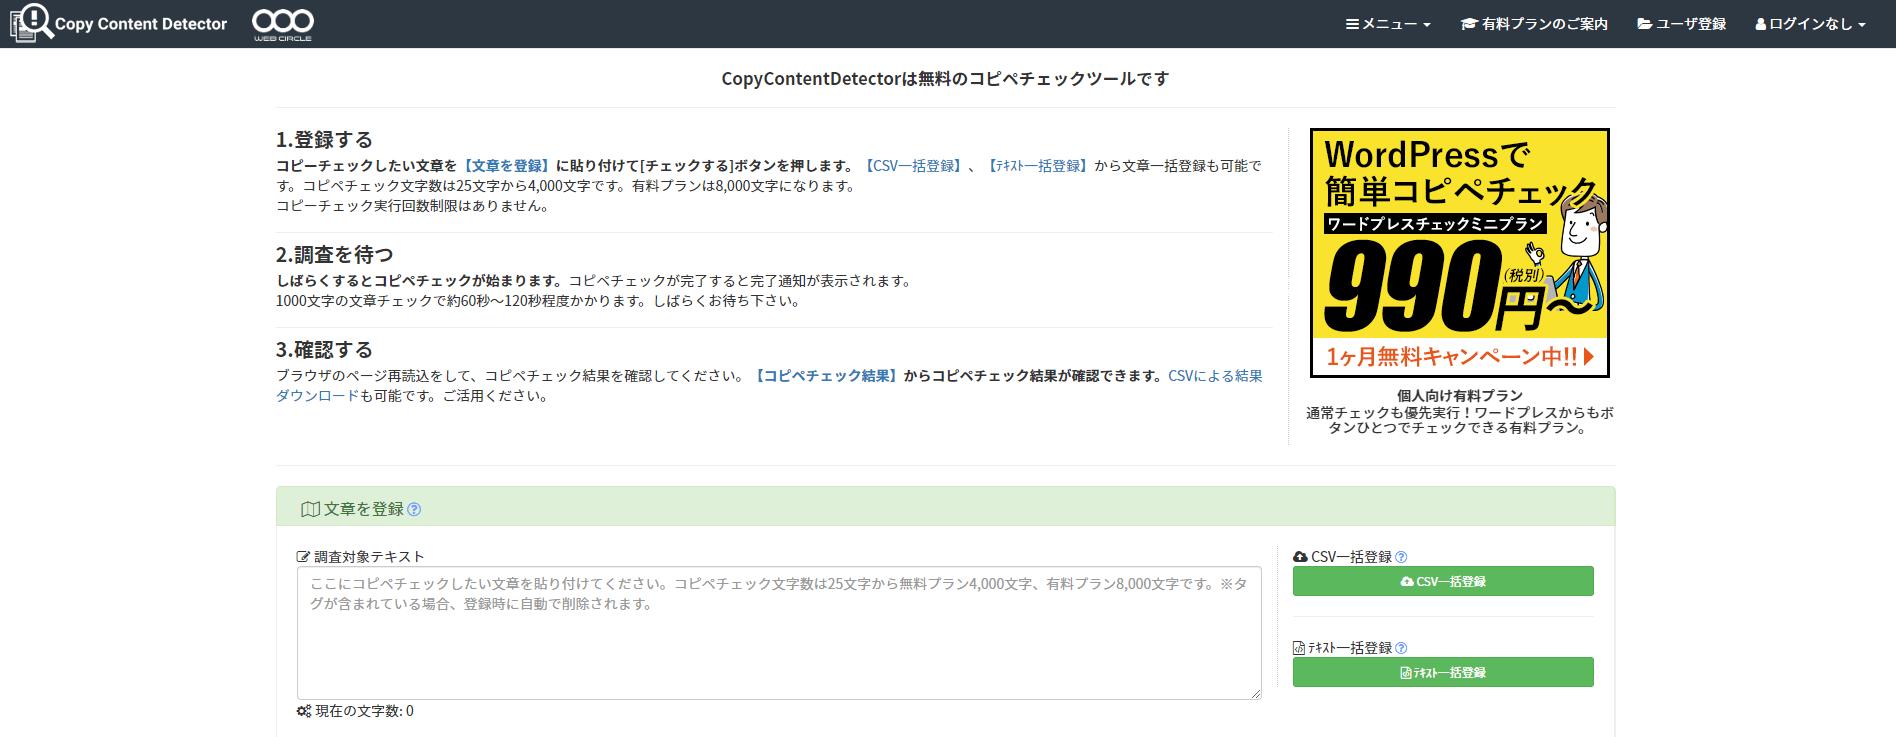 CopyContentDetector